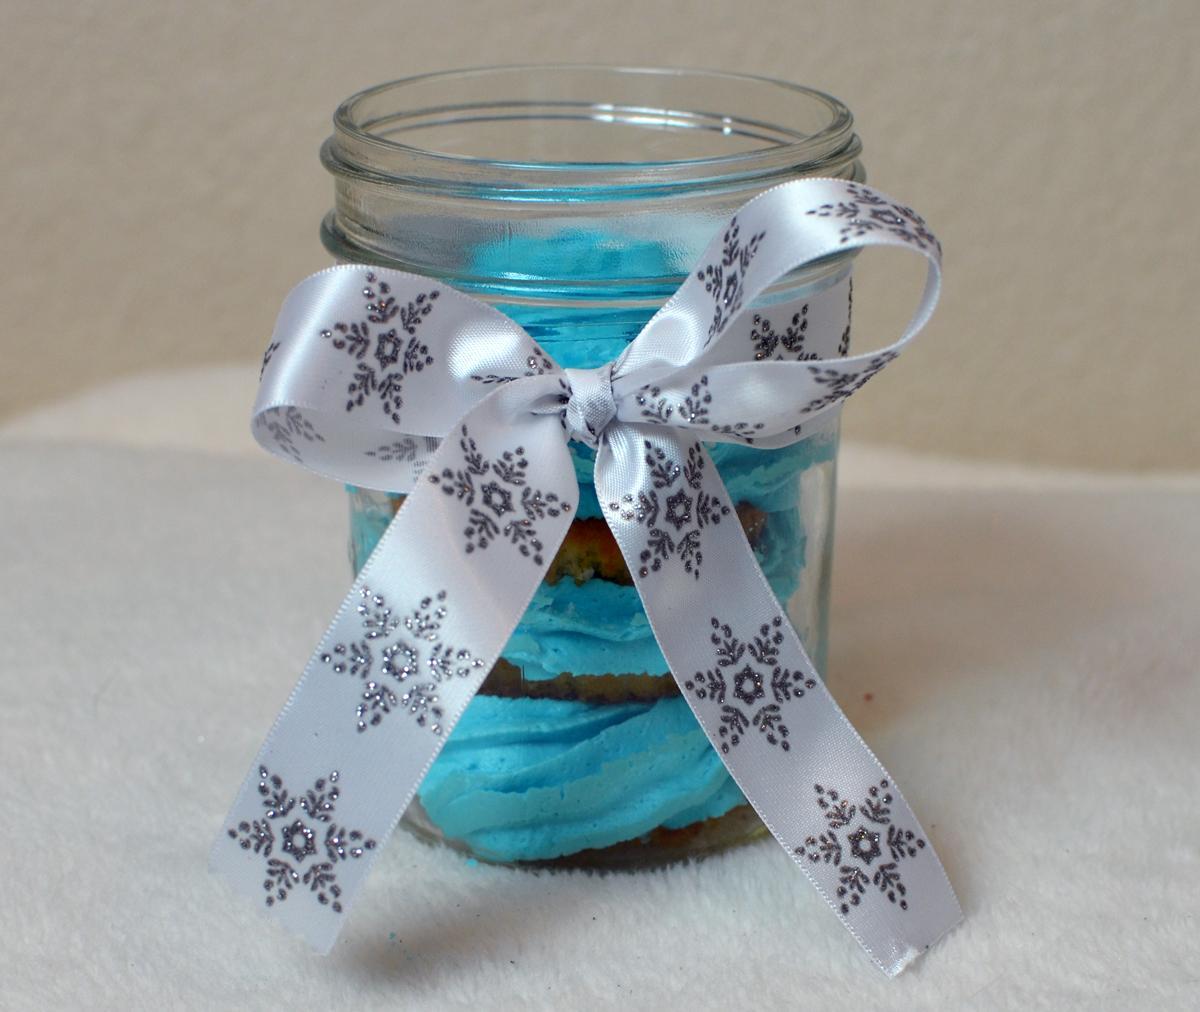 Jar with Cake icing